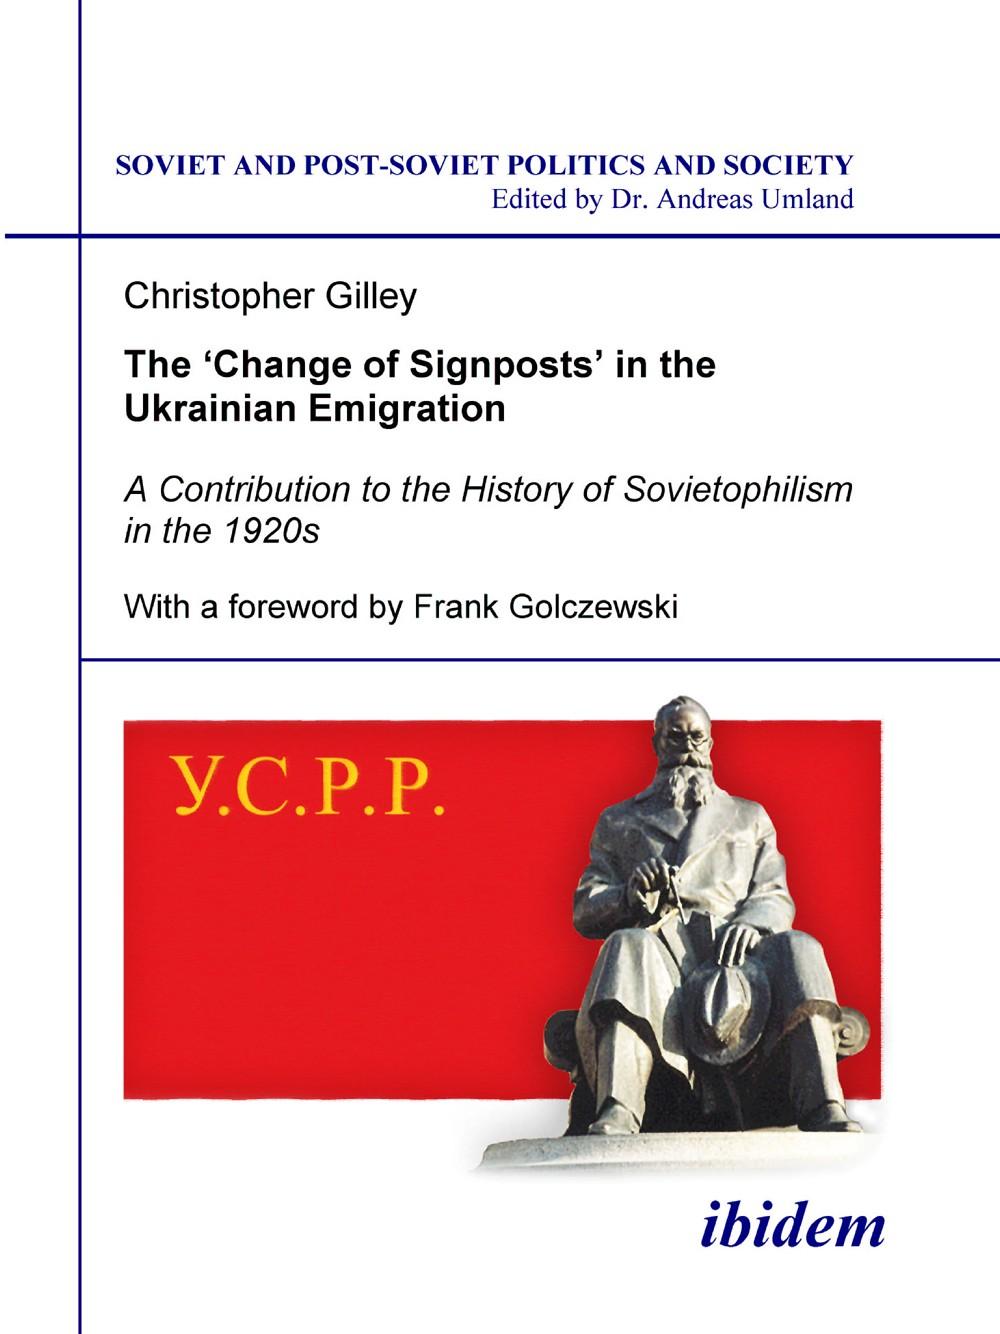 The 'Change of Signposts' in the Ukrainian Emigration